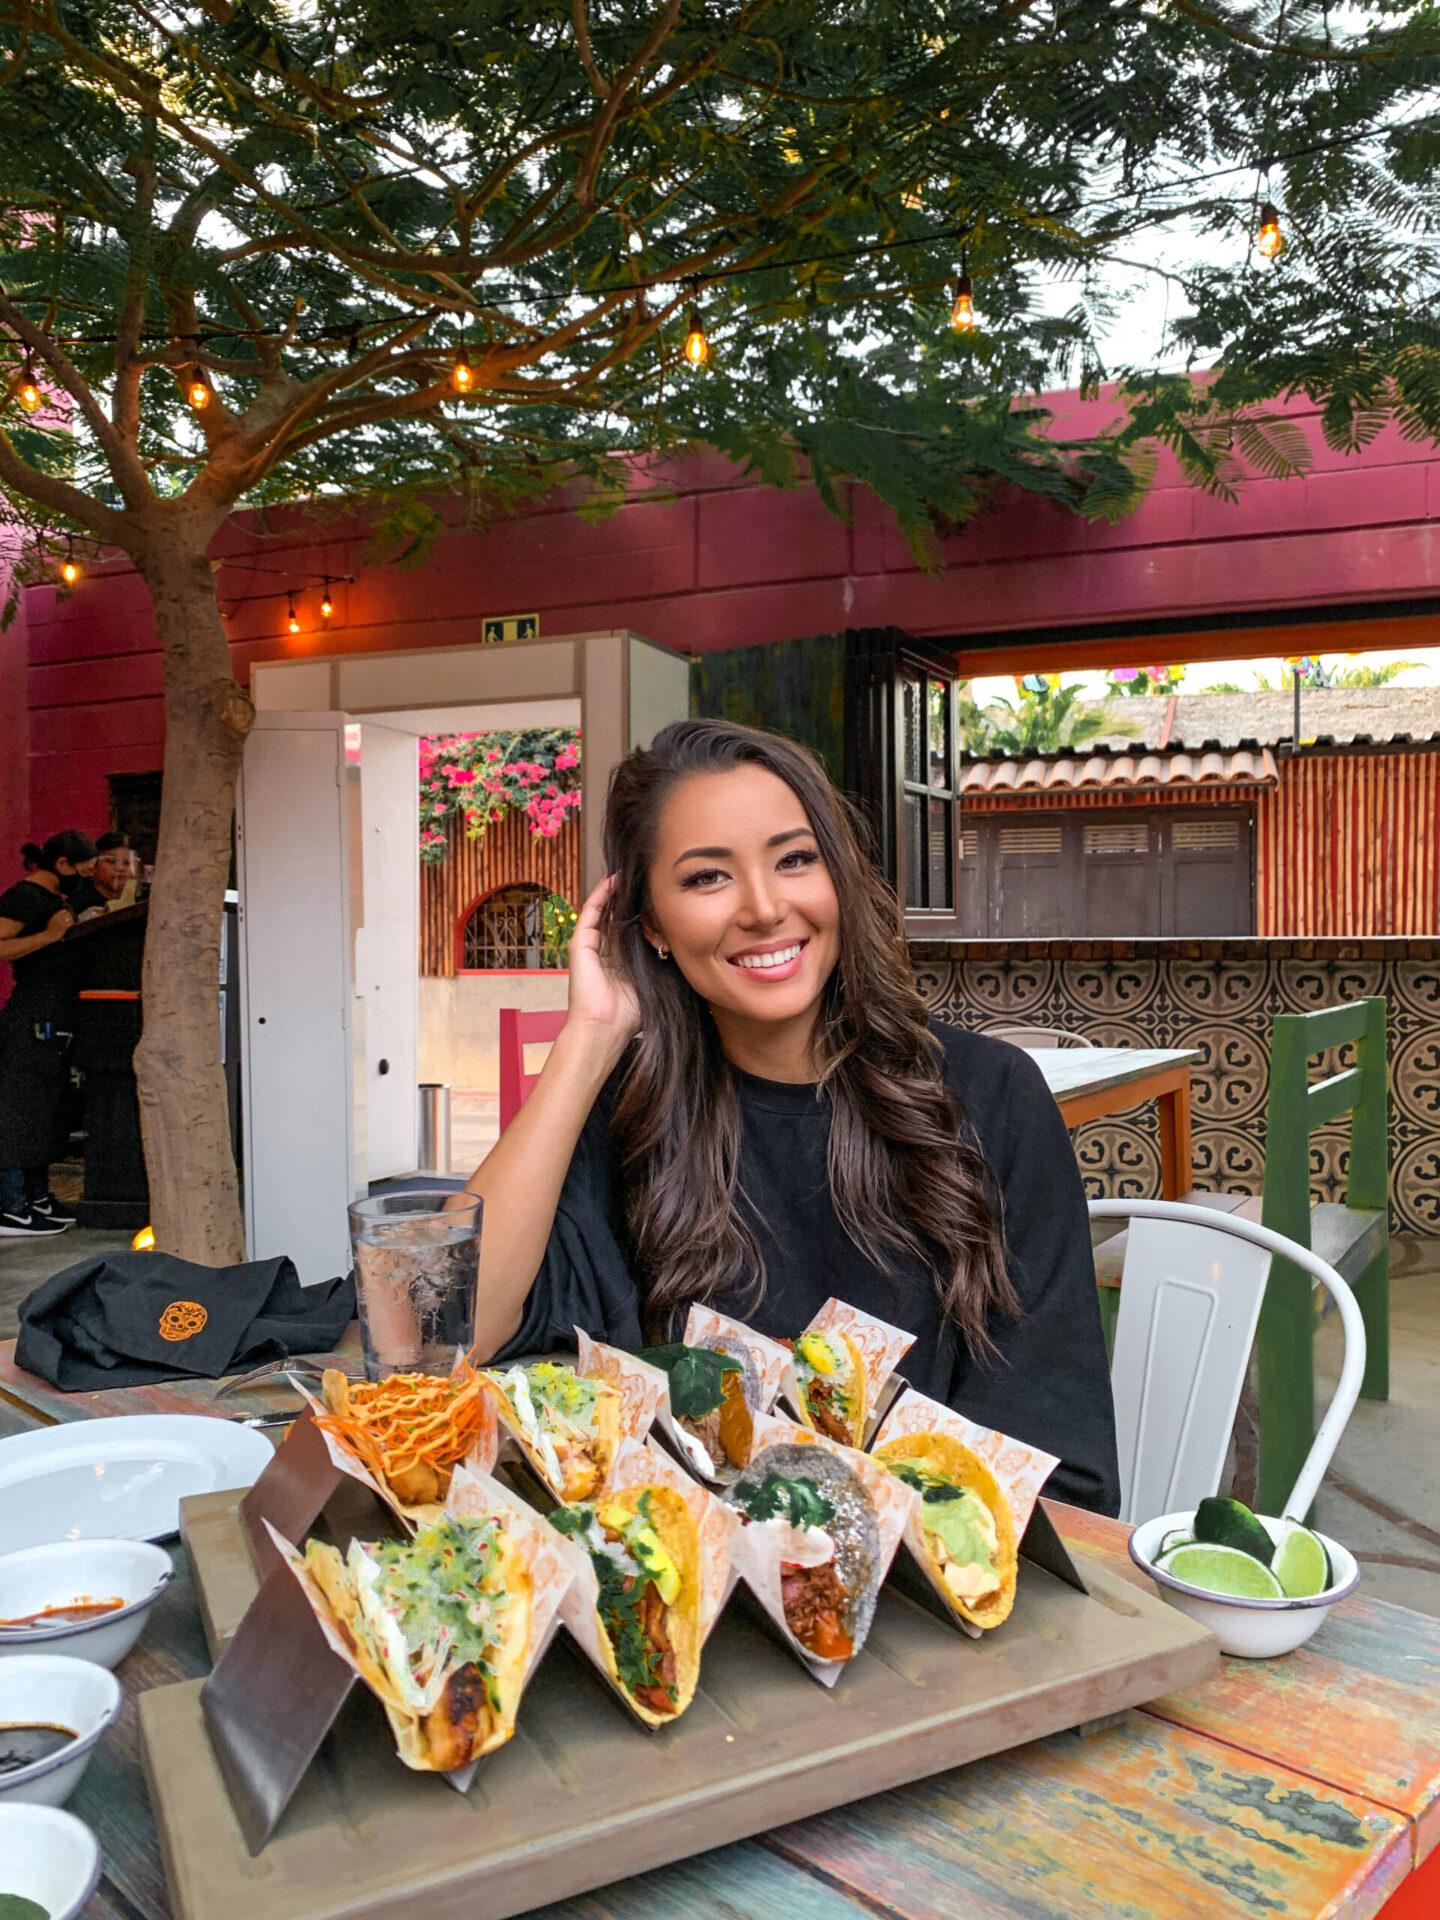 la lupita, cabo, cabo san lucas, mexico, travel, mexican food, tacos